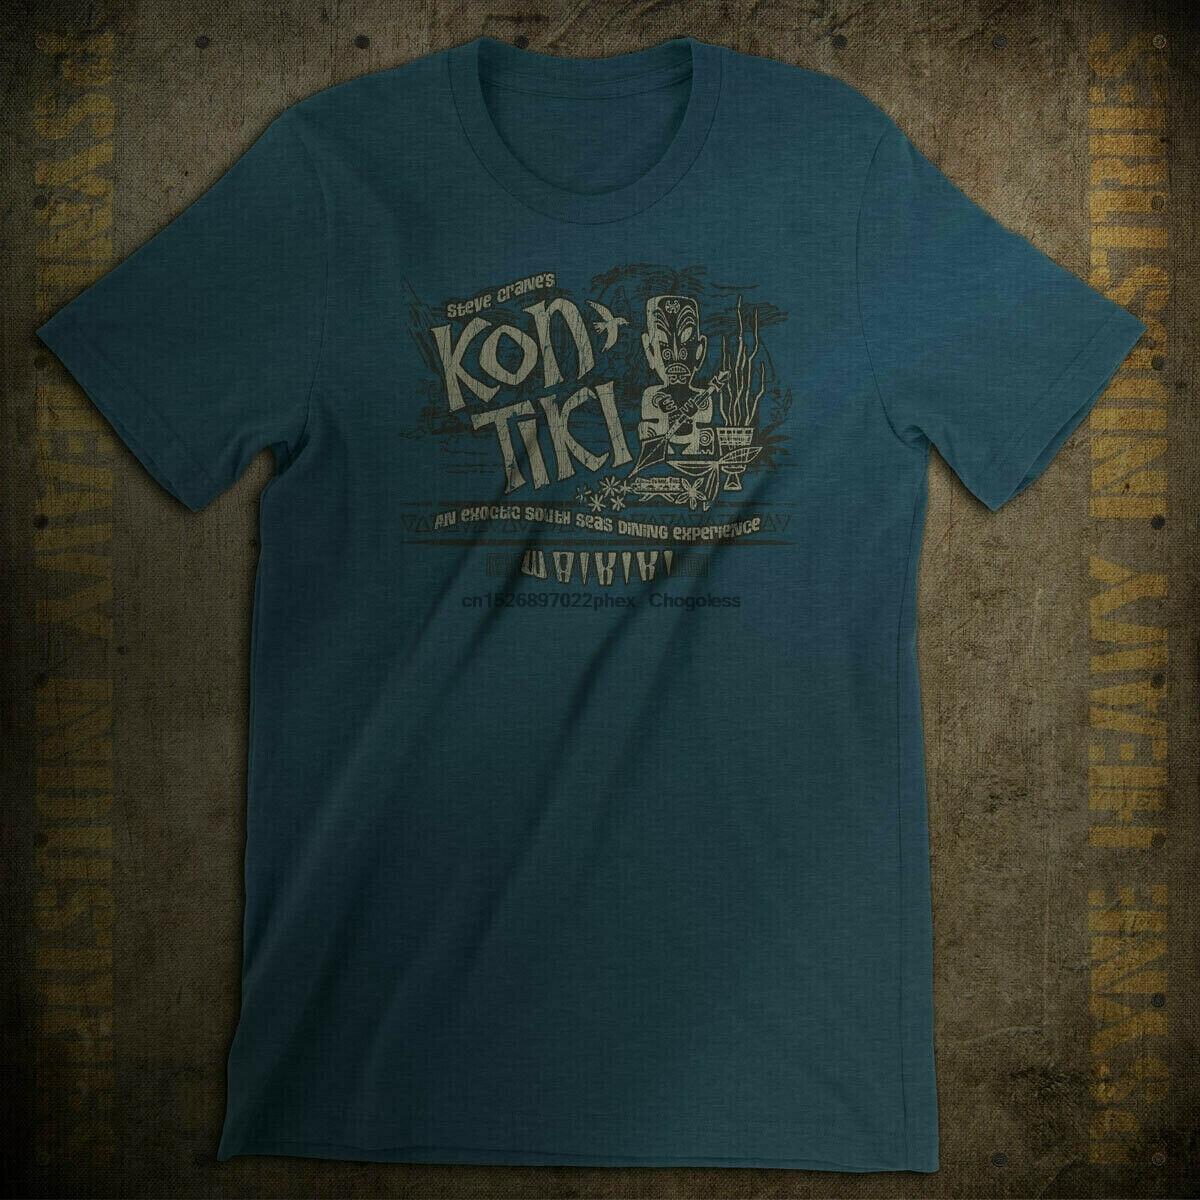 Steve Kran der Kon Tiki Waikiki Vintage Polynesian T-Shirt